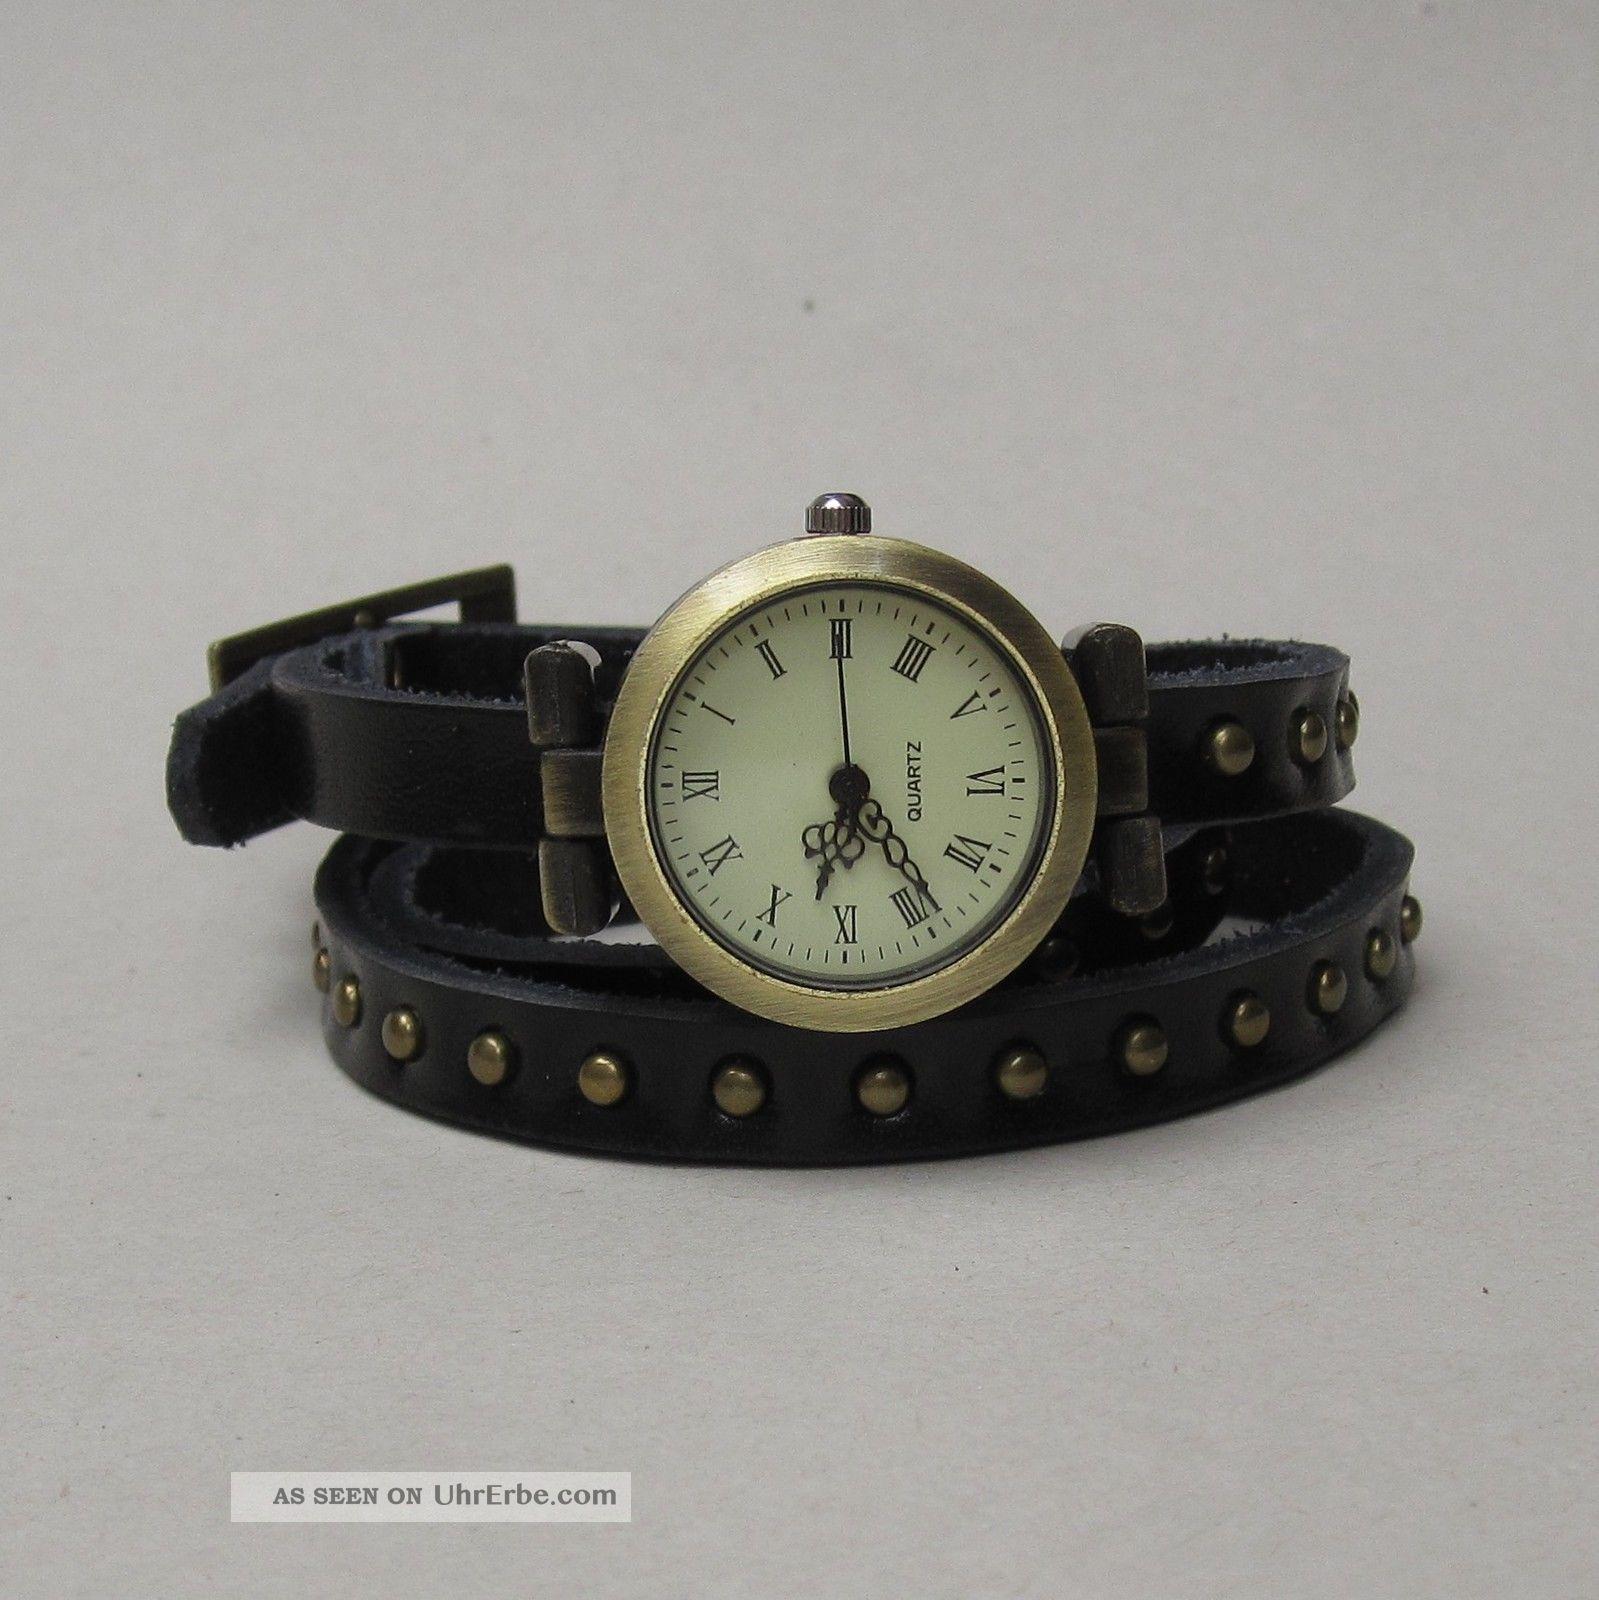 Uhren b ware